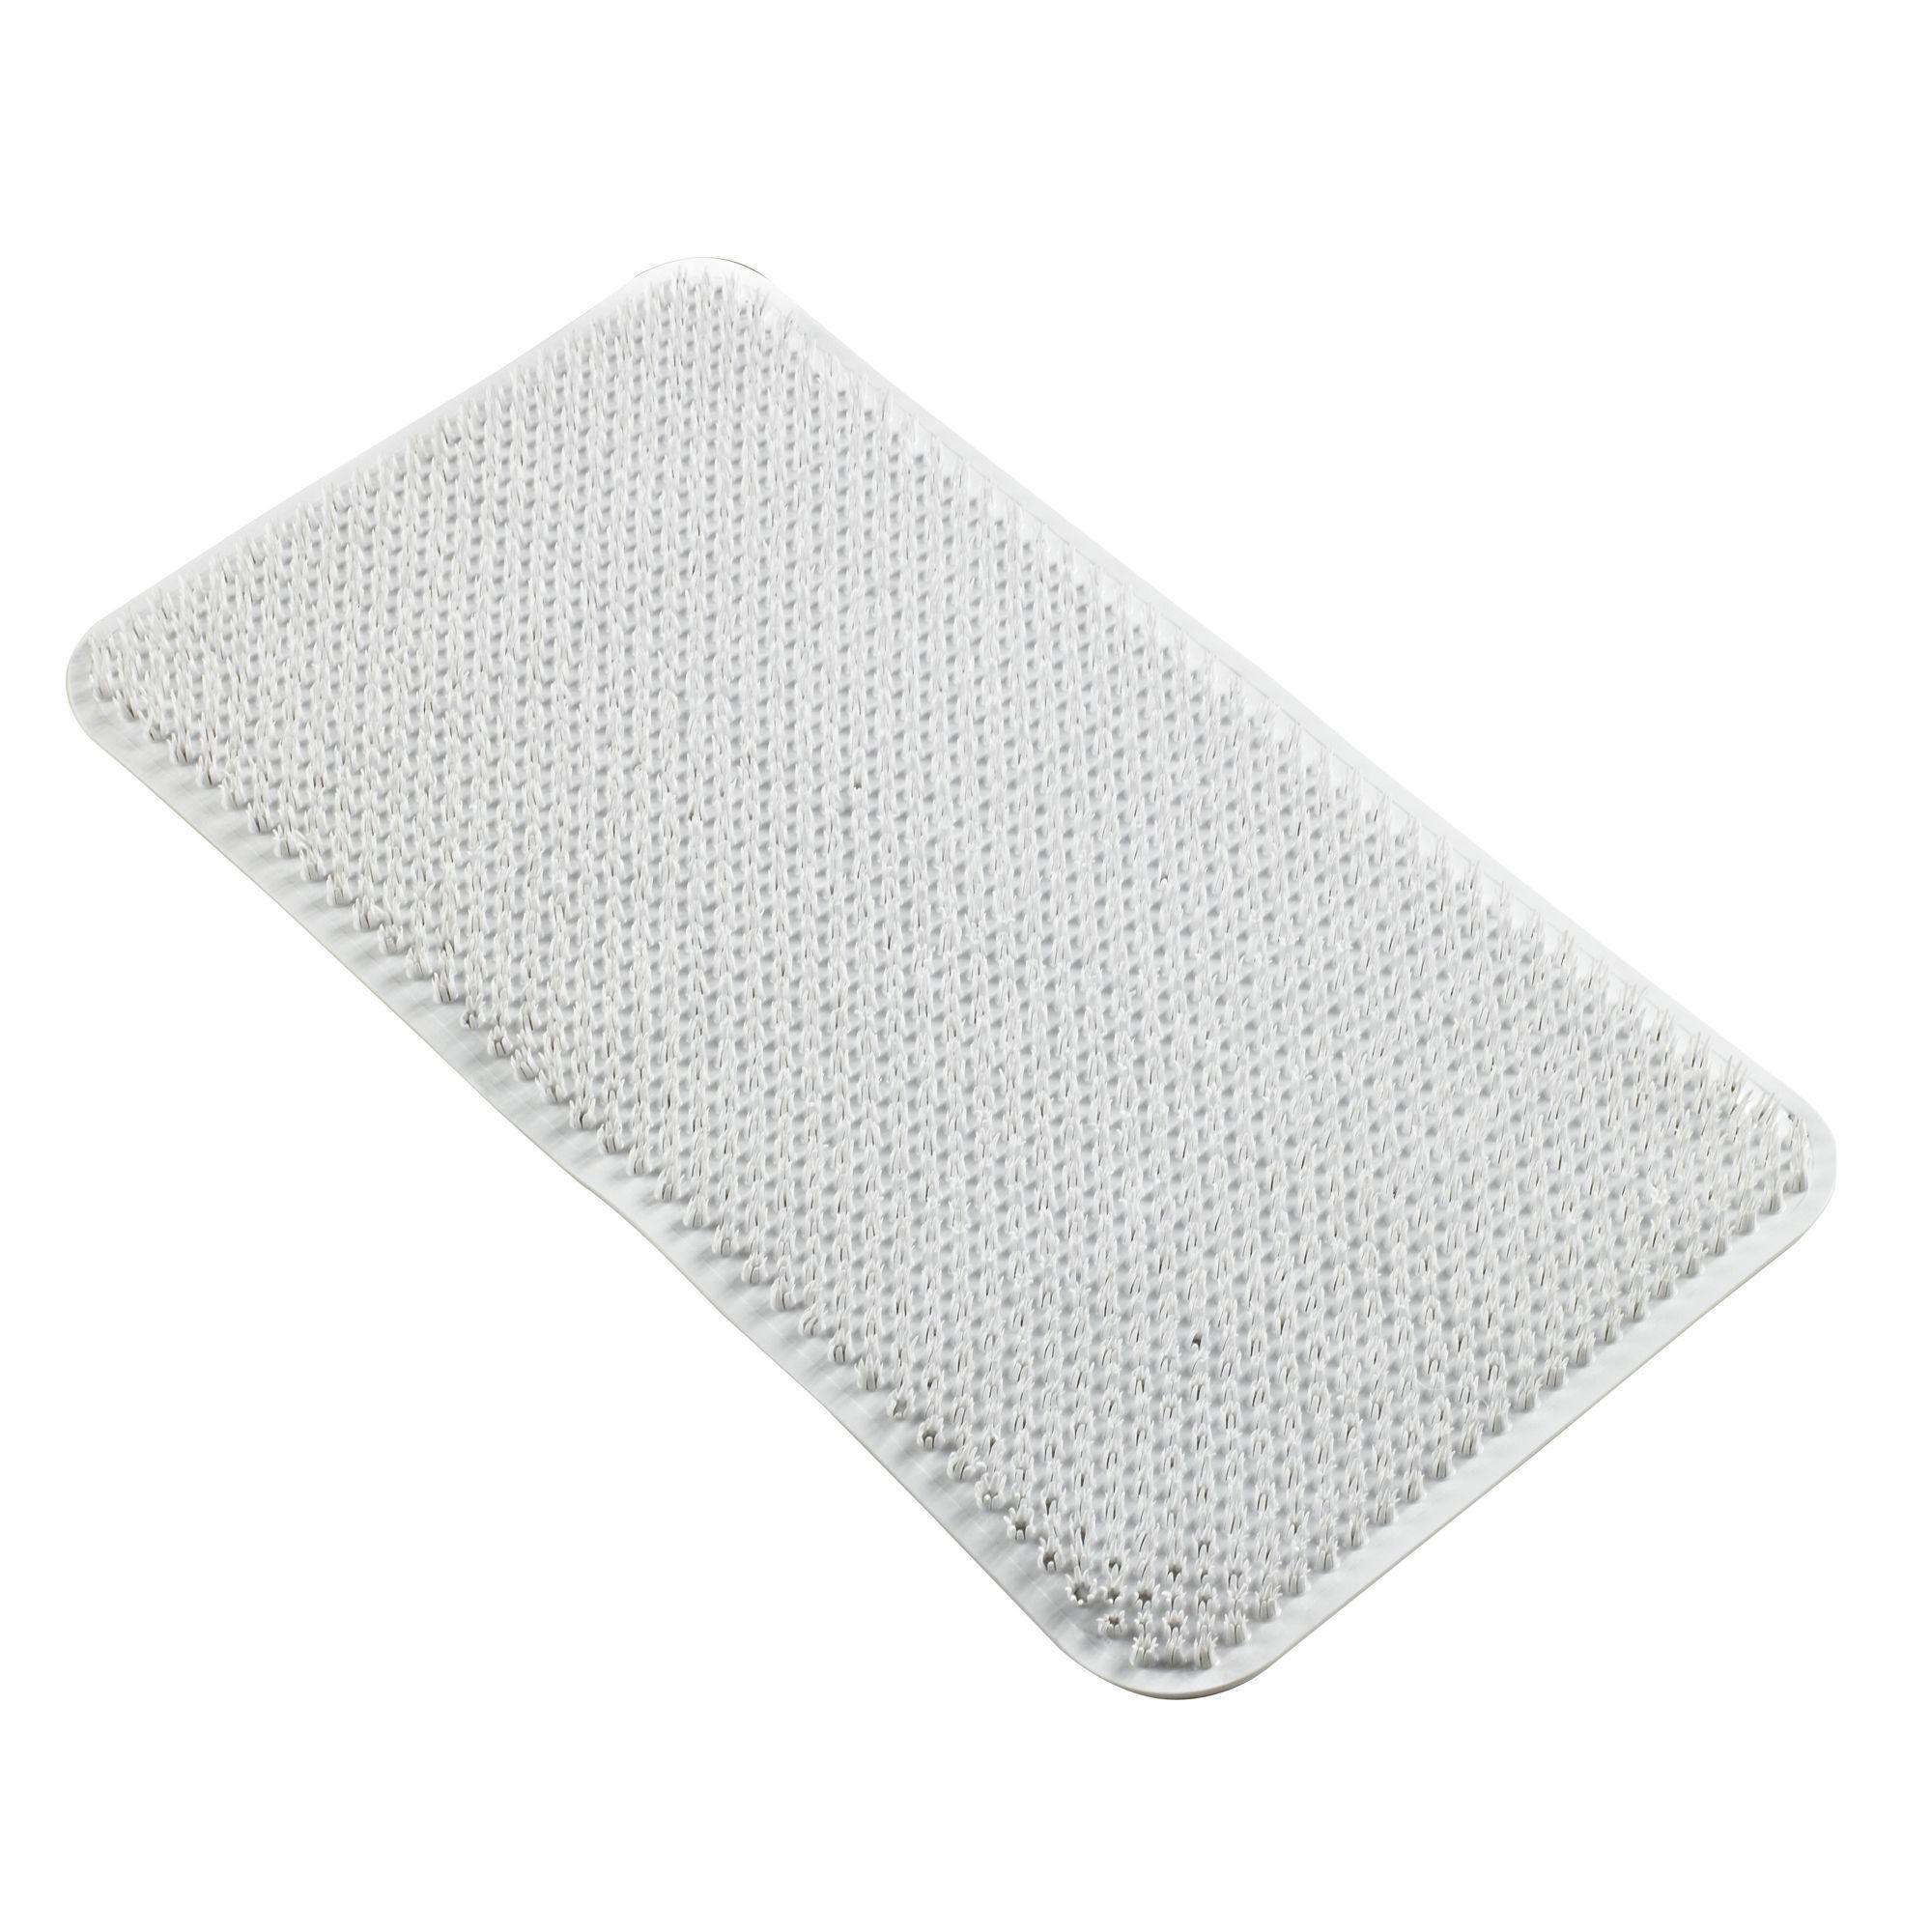 B&q White Soft Textured Coral Effect Pvc Anti-slip Bath Mat (l)650mm (w)350mm